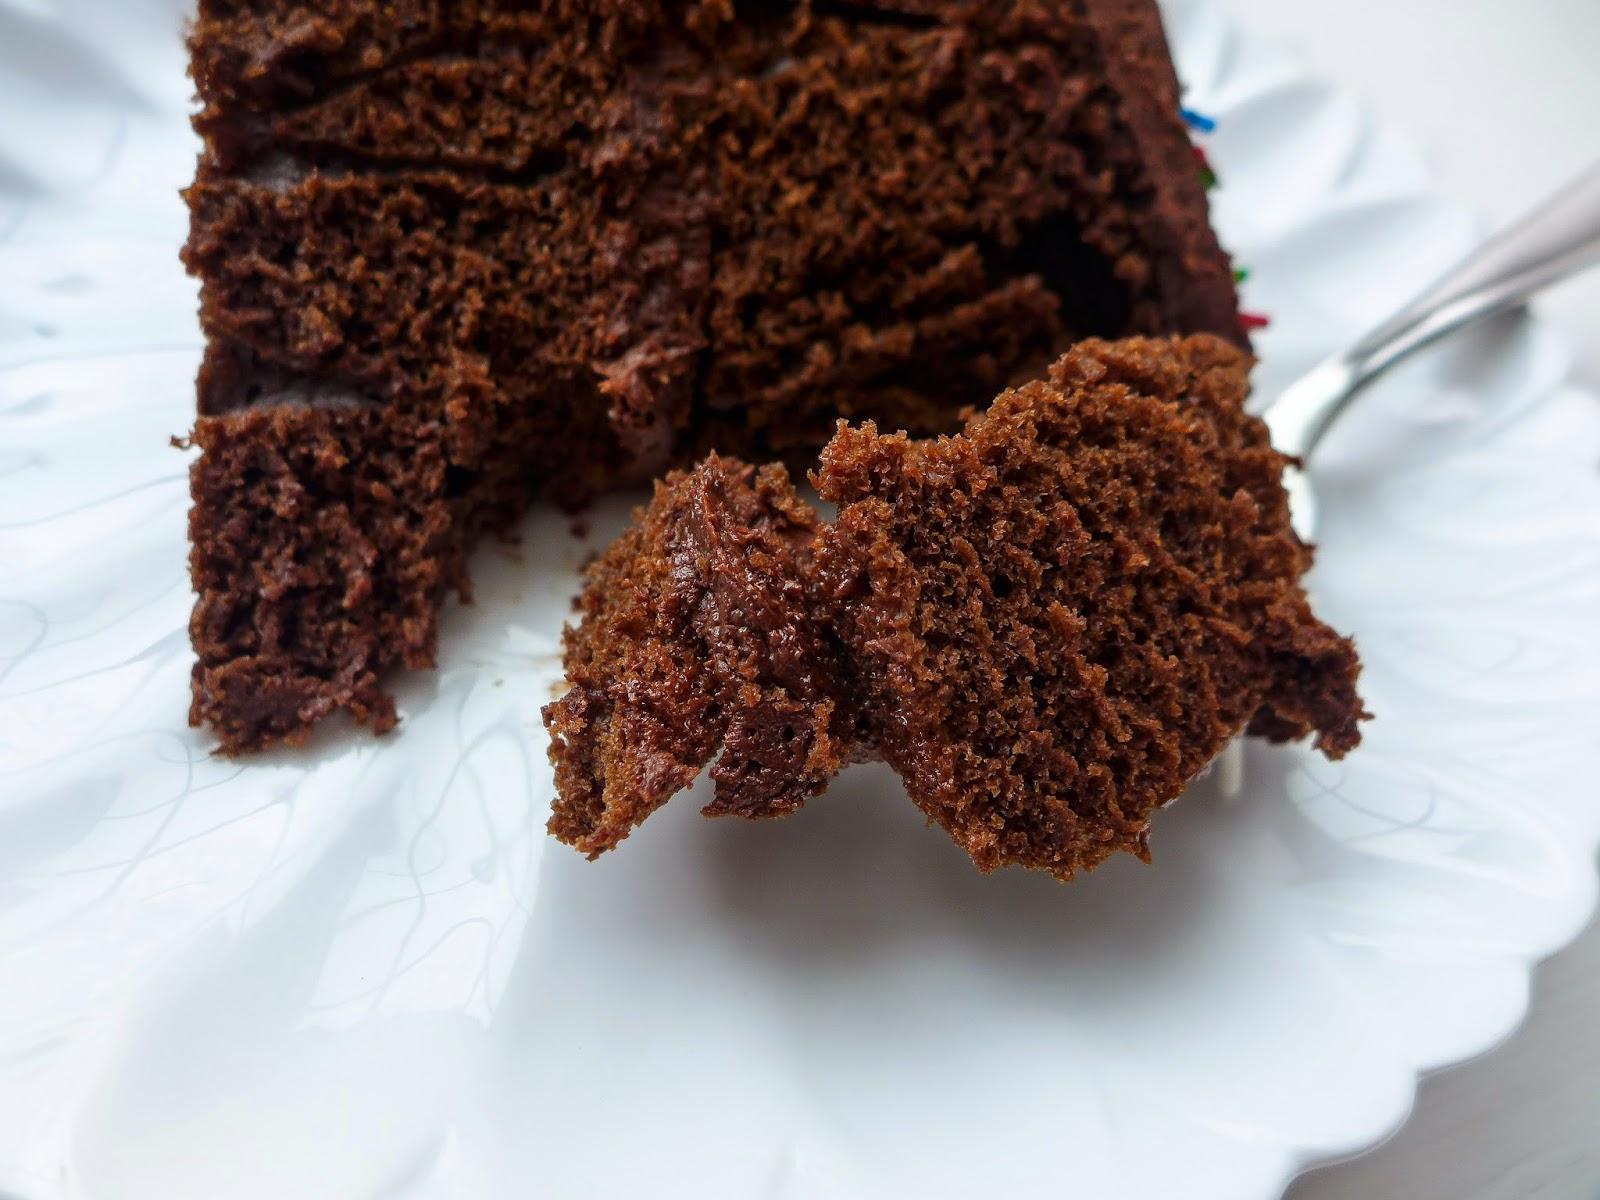 Best Darn Chocolate Cake Ever